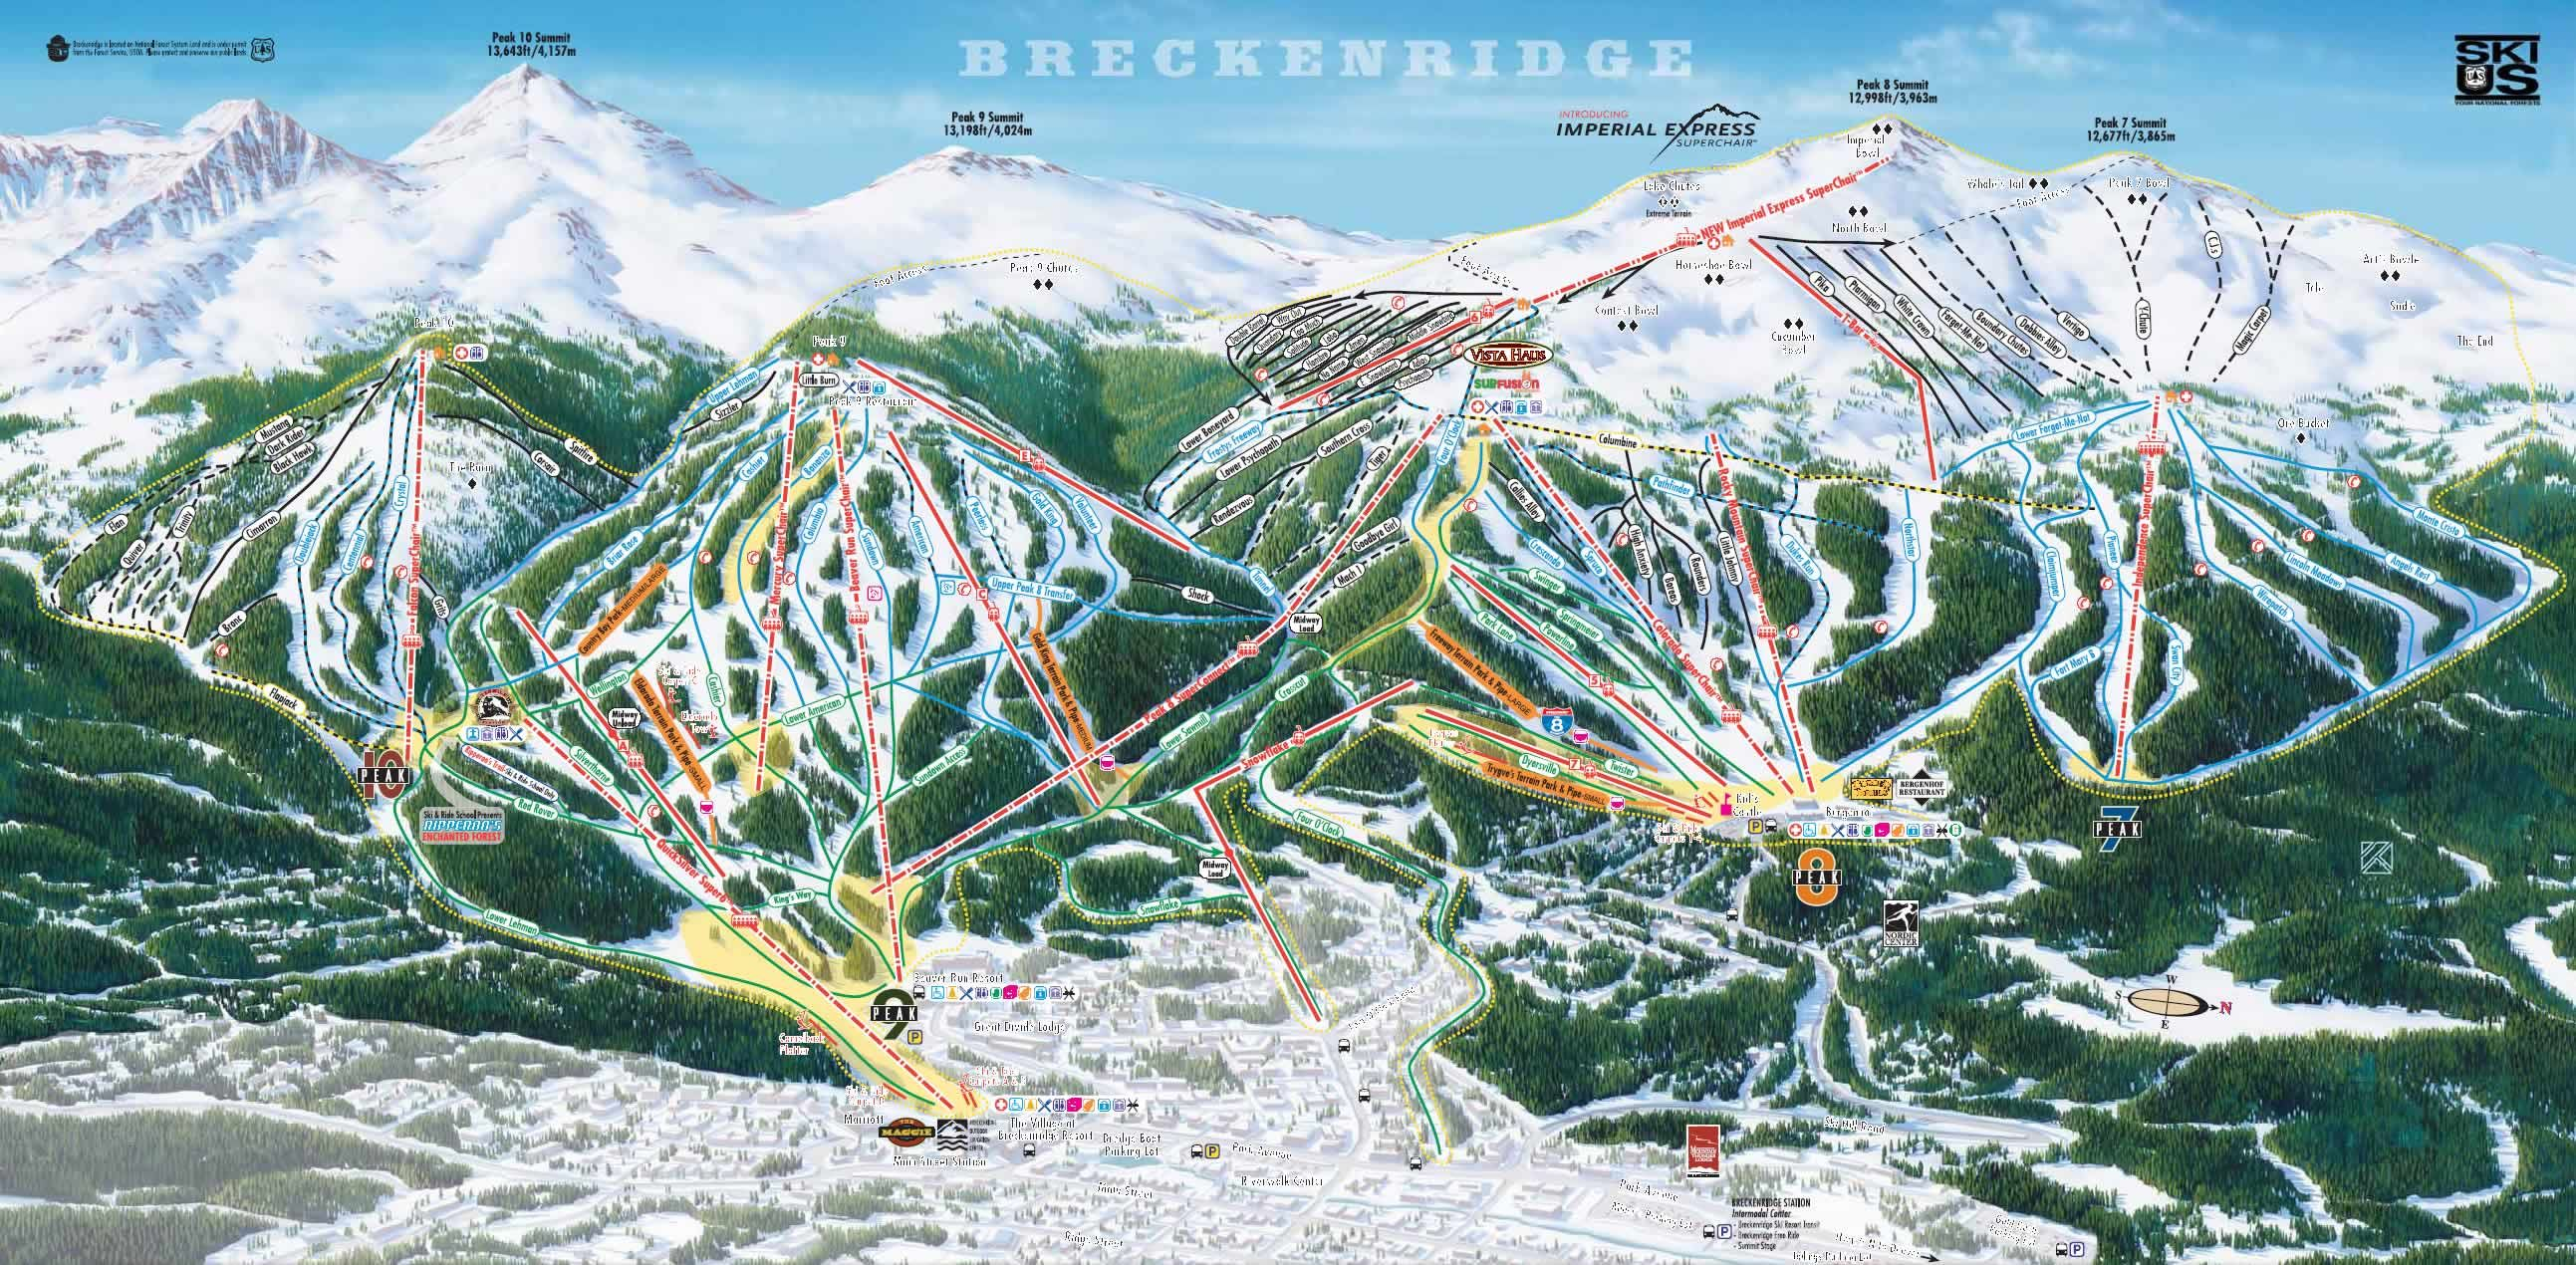 Breckenridge Ski Resort Http Mski Co Listing Breckenridge Ski Resort Breckenridge Ski Resort Ski Breckenridge Colorado Skiing